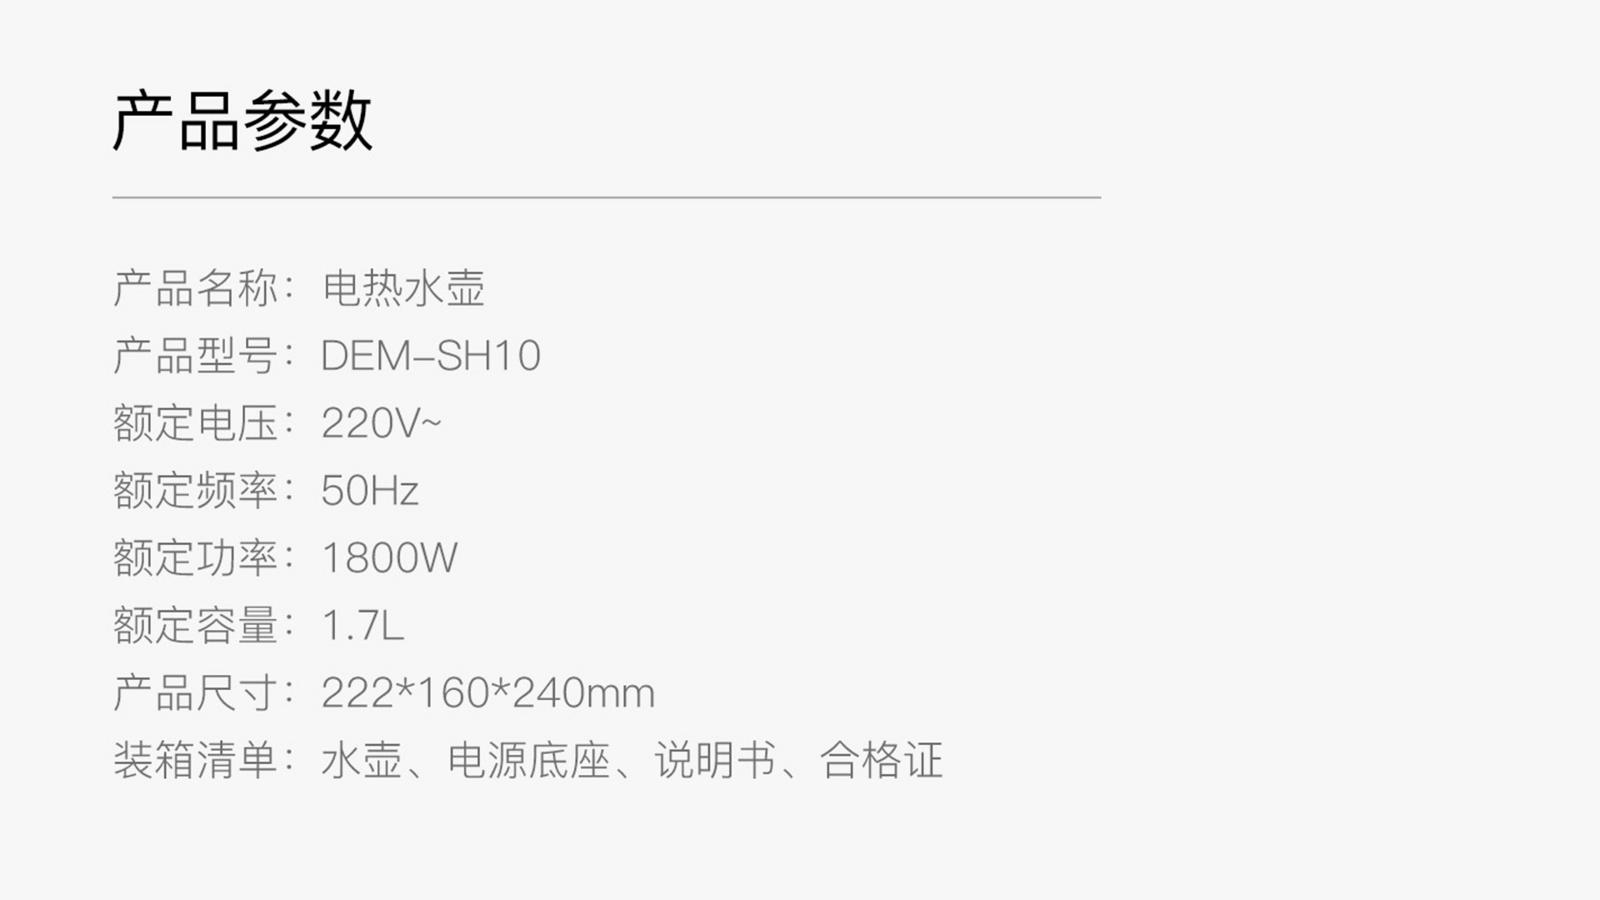 1600x_image.png?1611577946